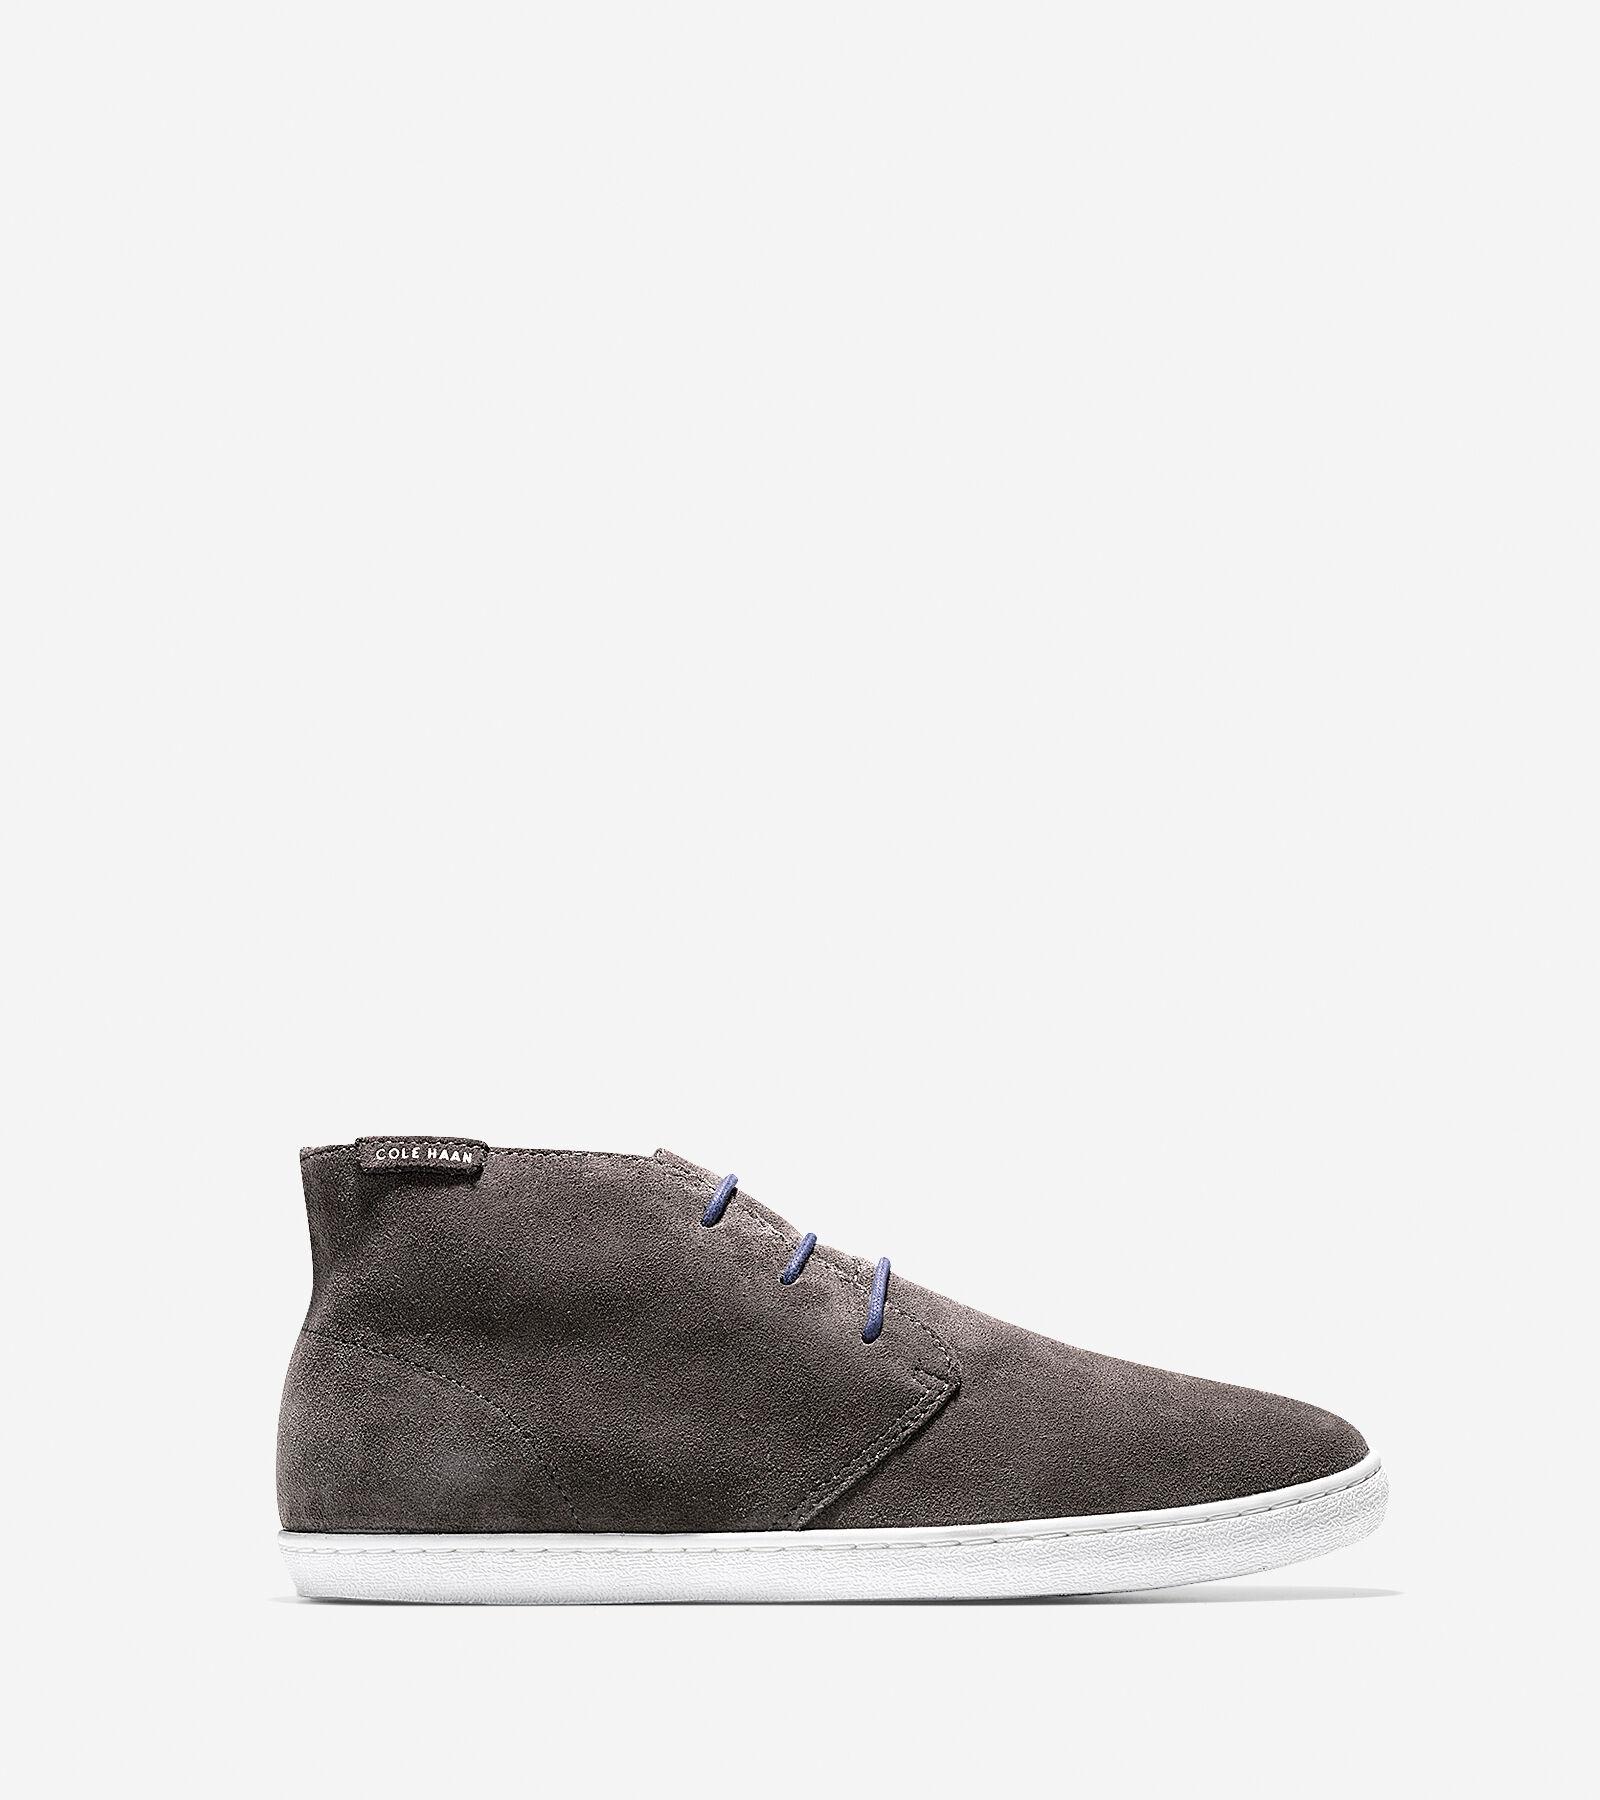 Love Mens Shoes Grey Cole Haan Nantucket Chukk Casual Shoes